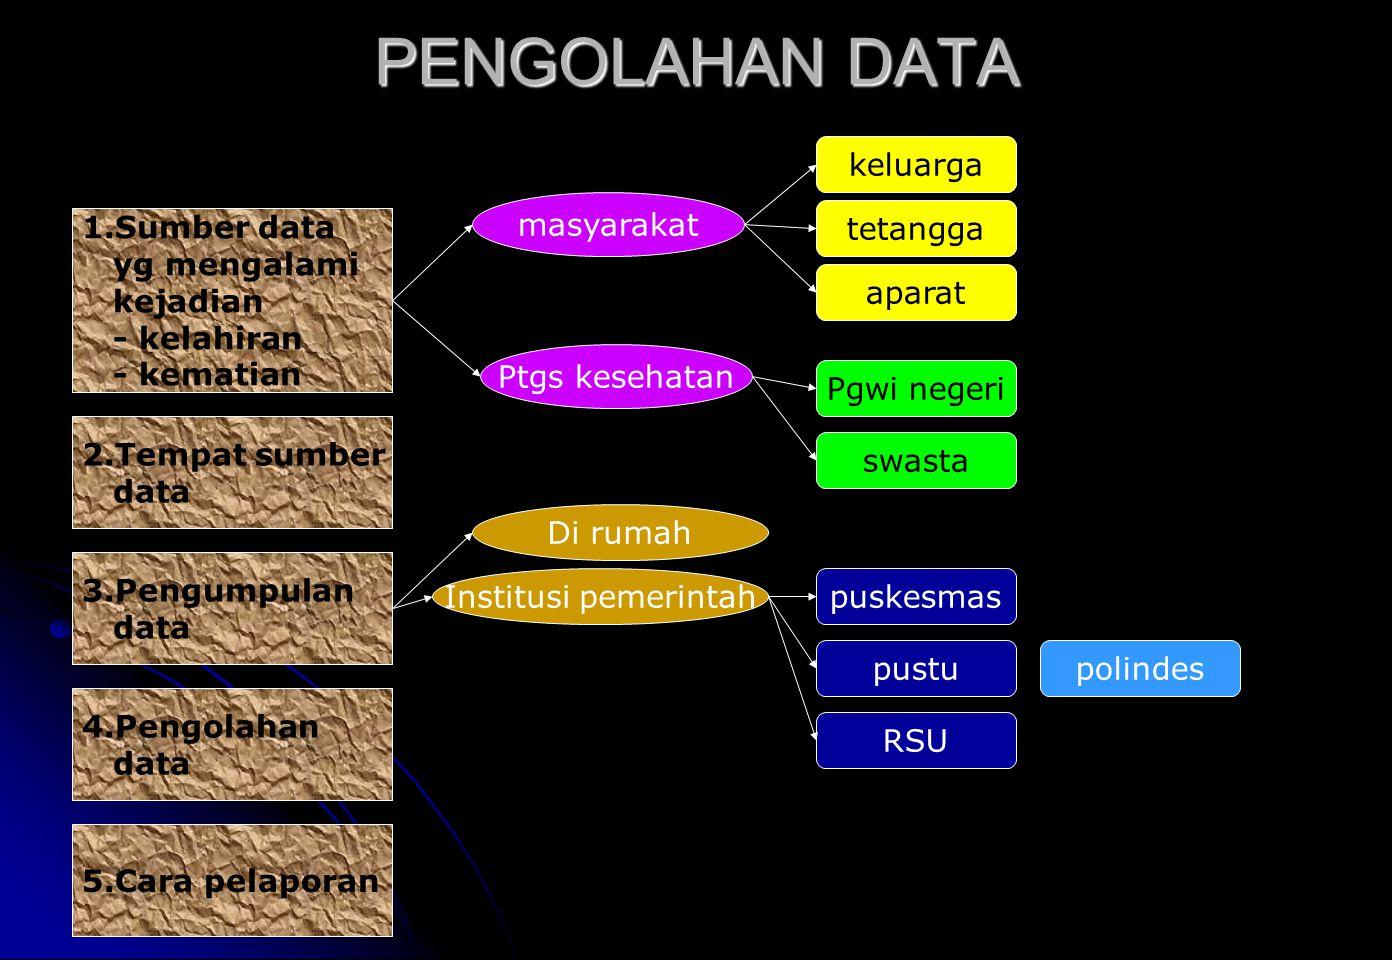 PENGOLAHAN DATA 1.Sumber data yg mengalami kejadian - kelahiran - kematian 2.Tempat sumber data 3.Pengumpulan data 4.Pengolahan data 5.Cara pelaporan